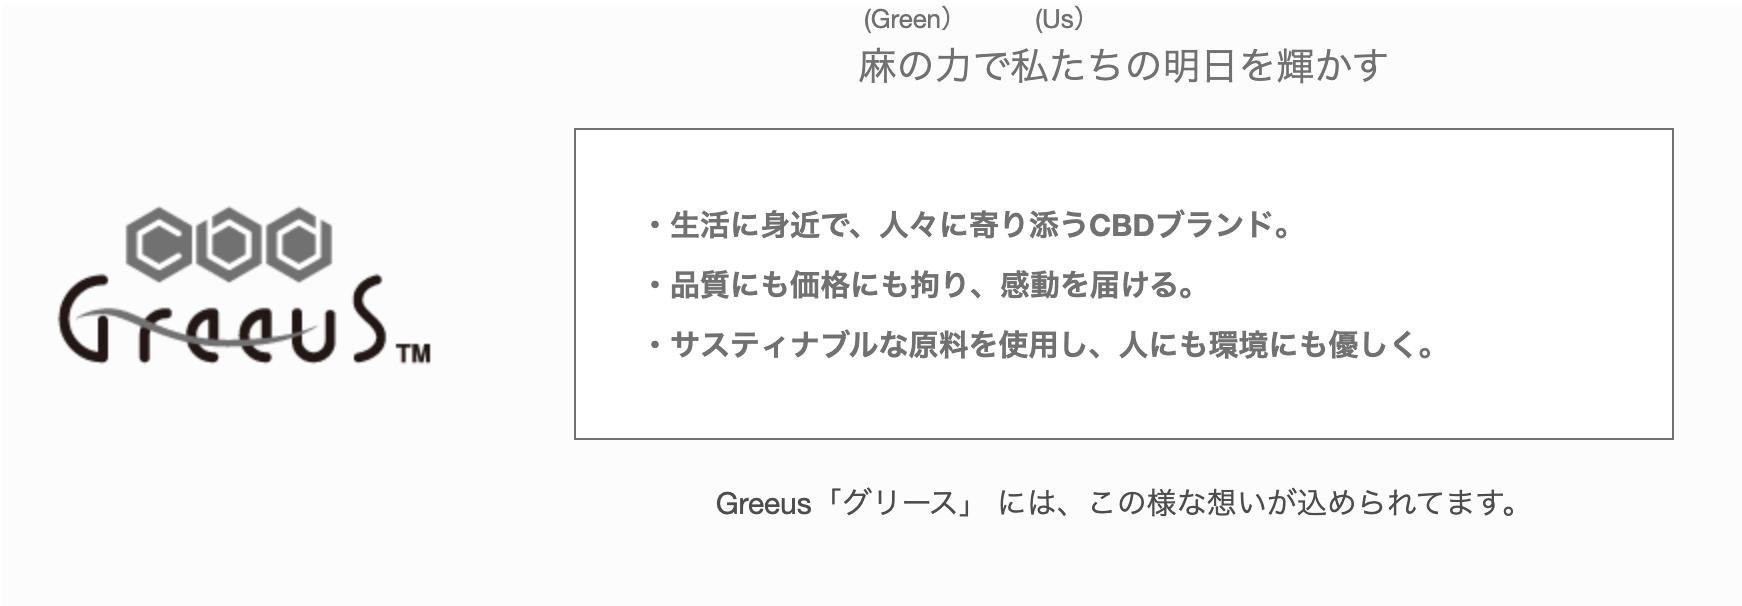 Greeus(グリース)の会社概要